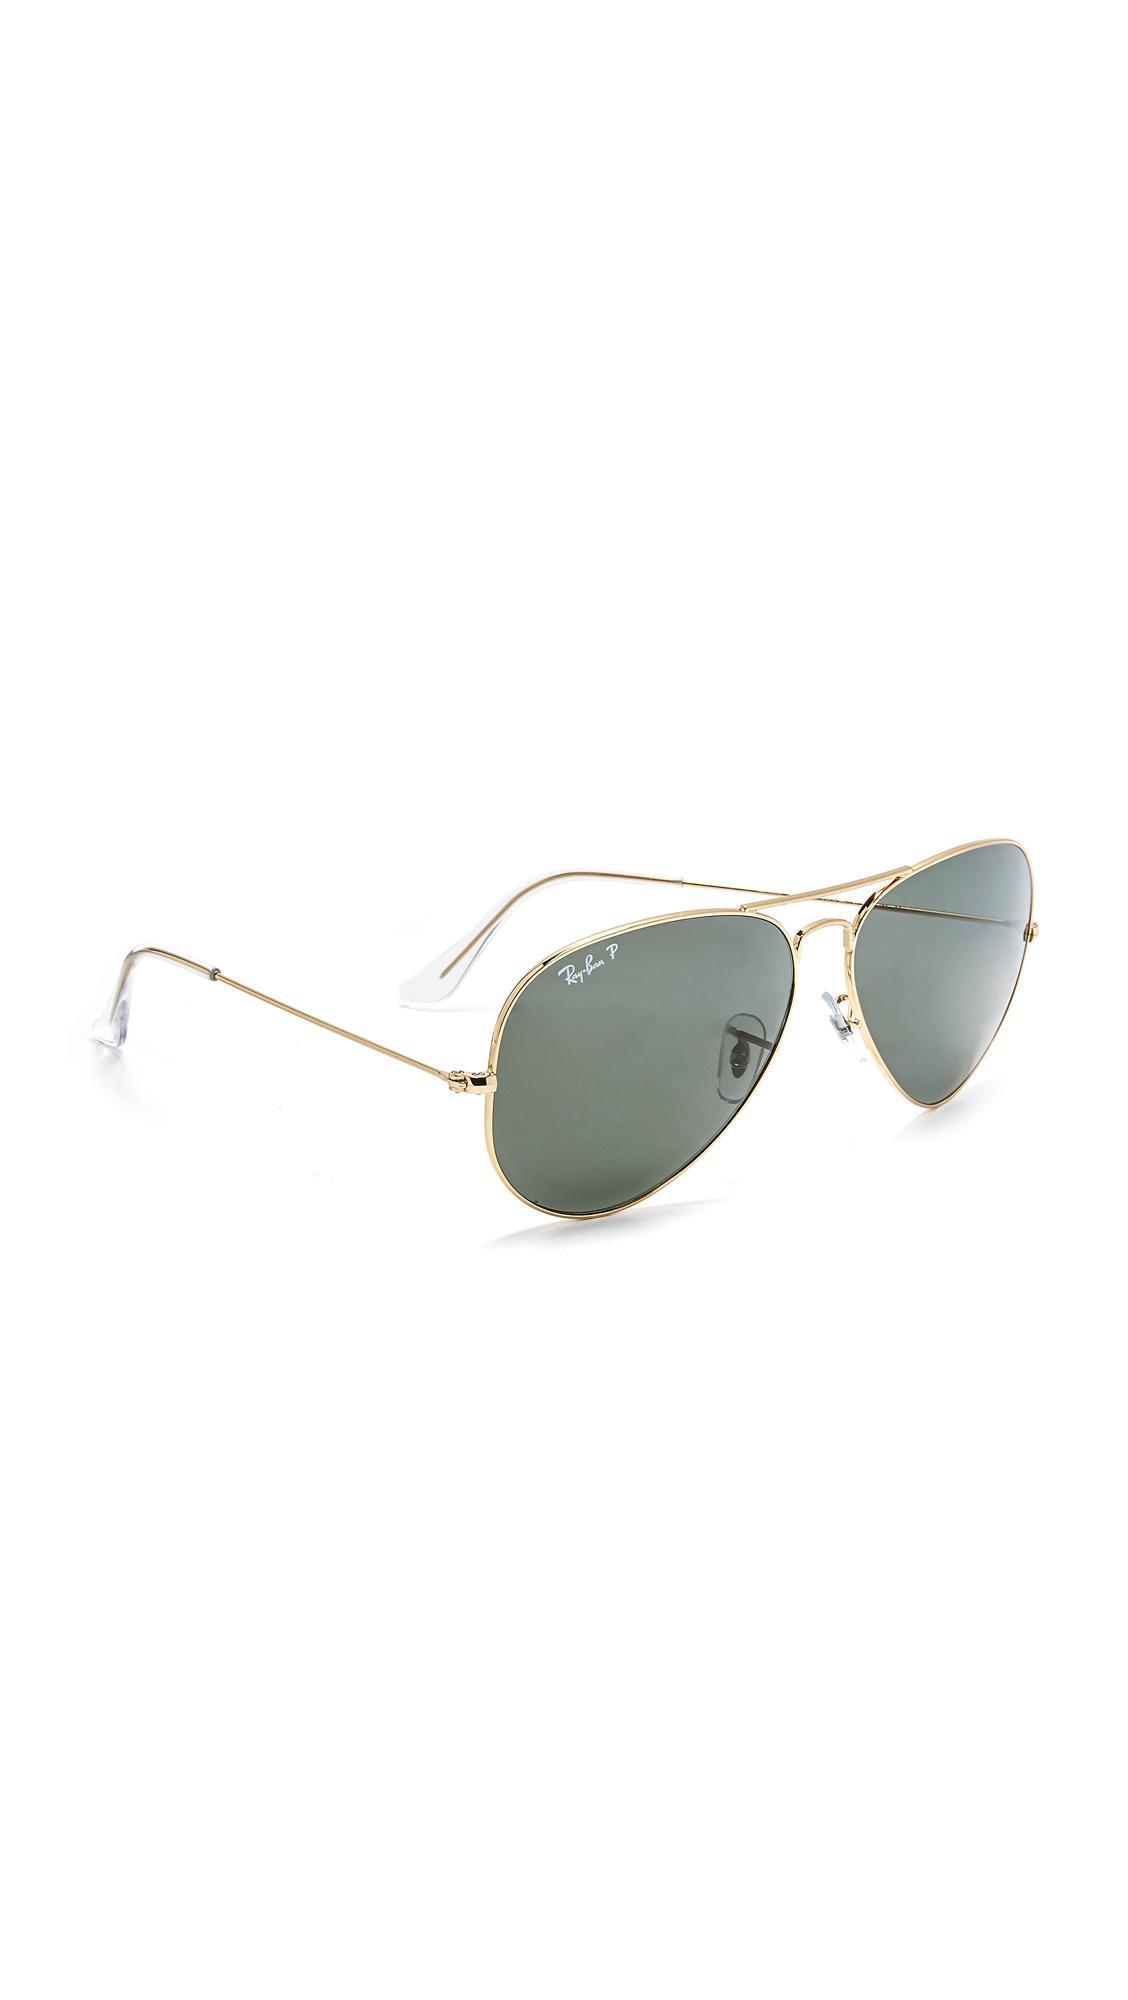 827cf1d25e Lyst - Ray-Ban Oversized Polarized Aviator Sunglasses - Save ...